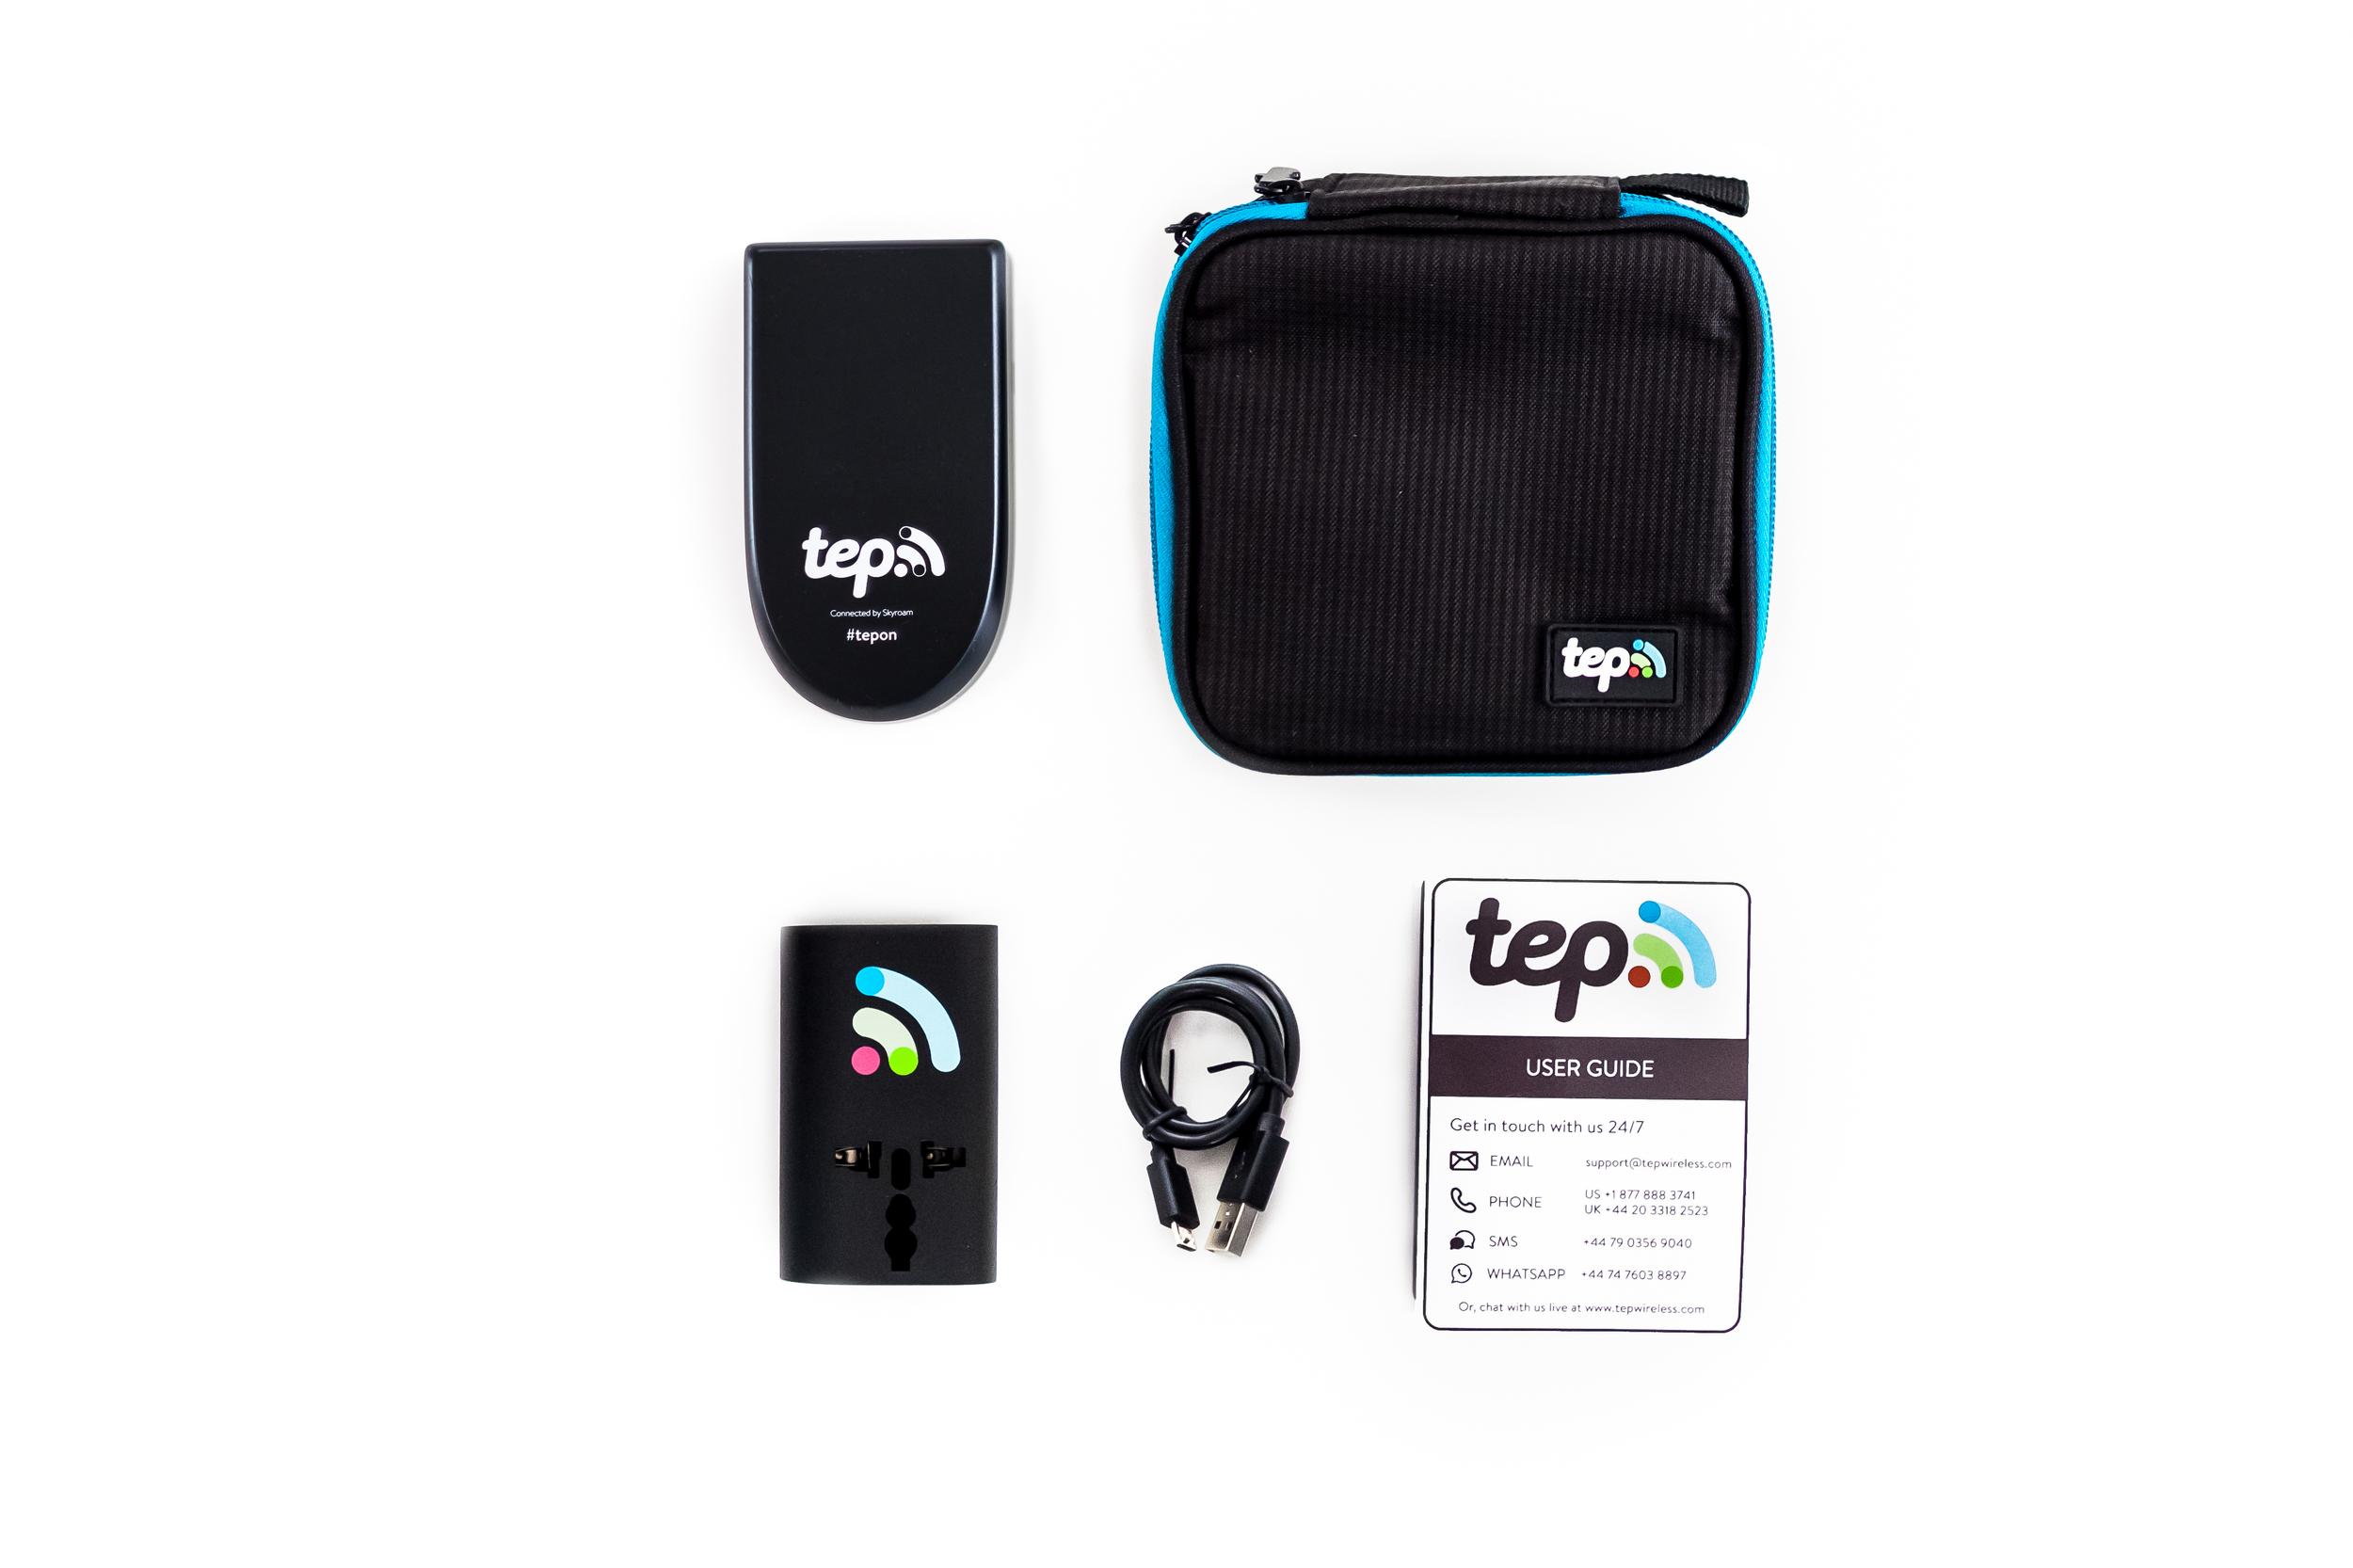 tep-wireless-013-Edit-2.jpg